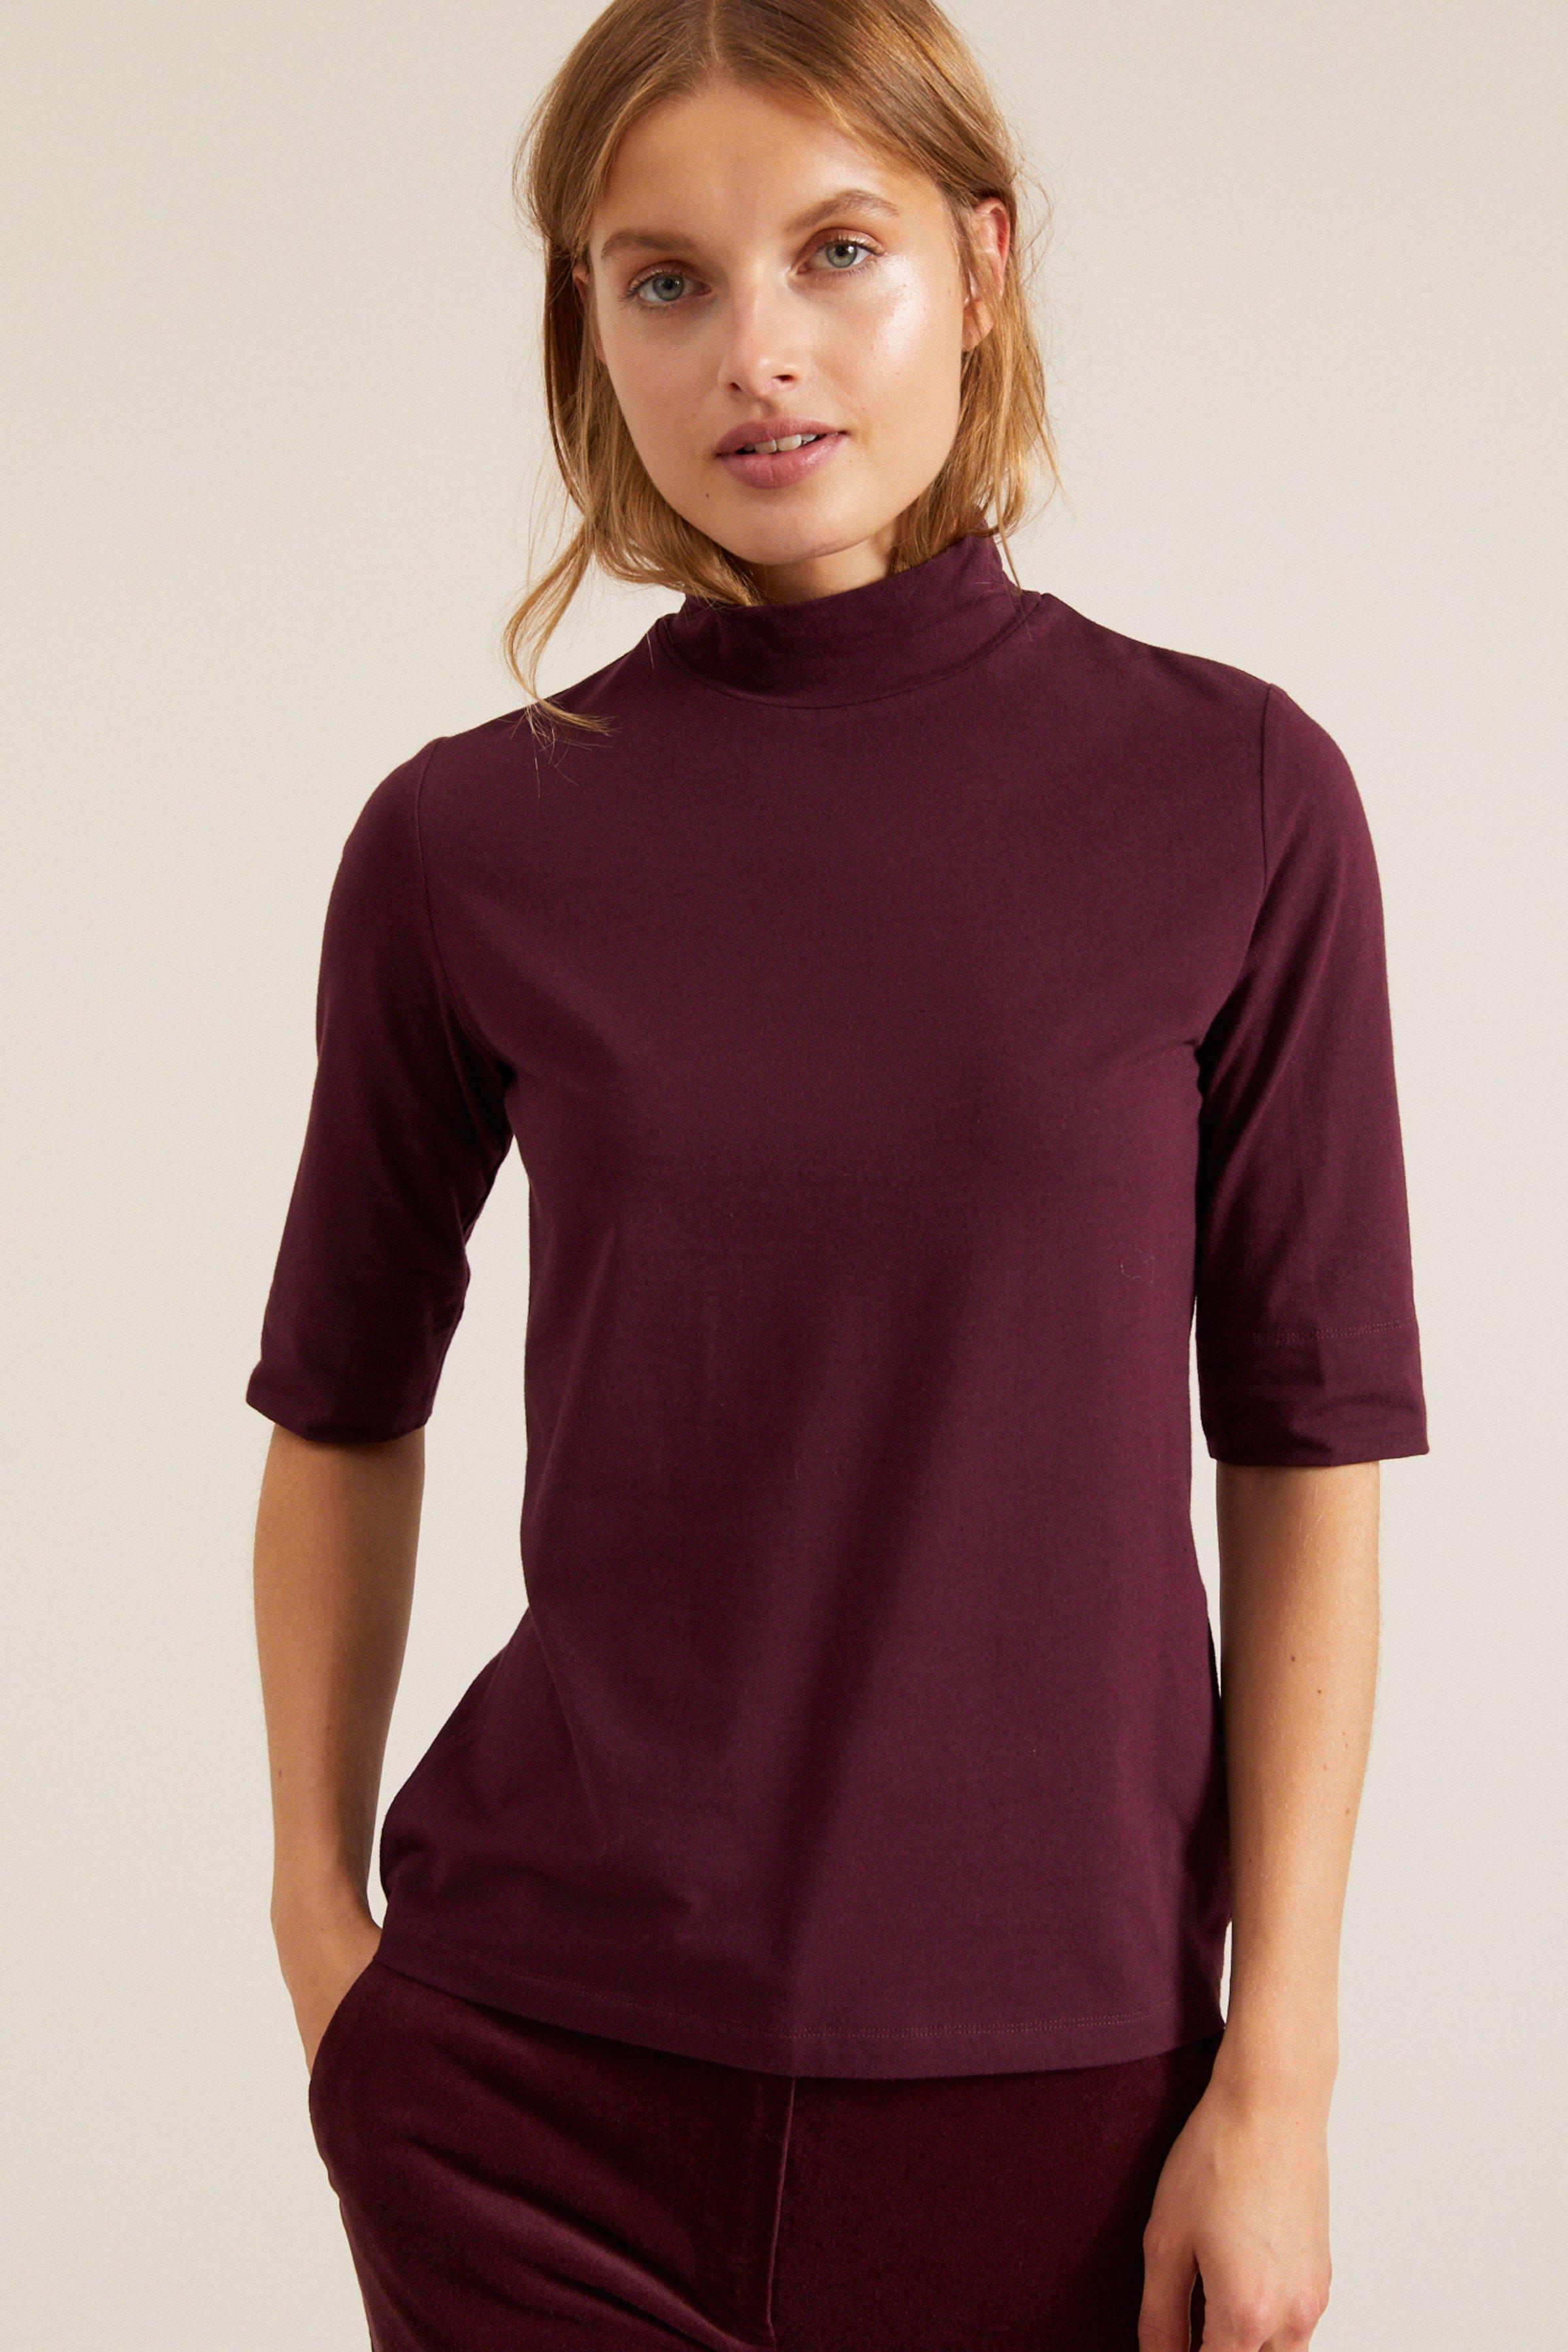 Shirt Stehkragen Lila from LOVECO